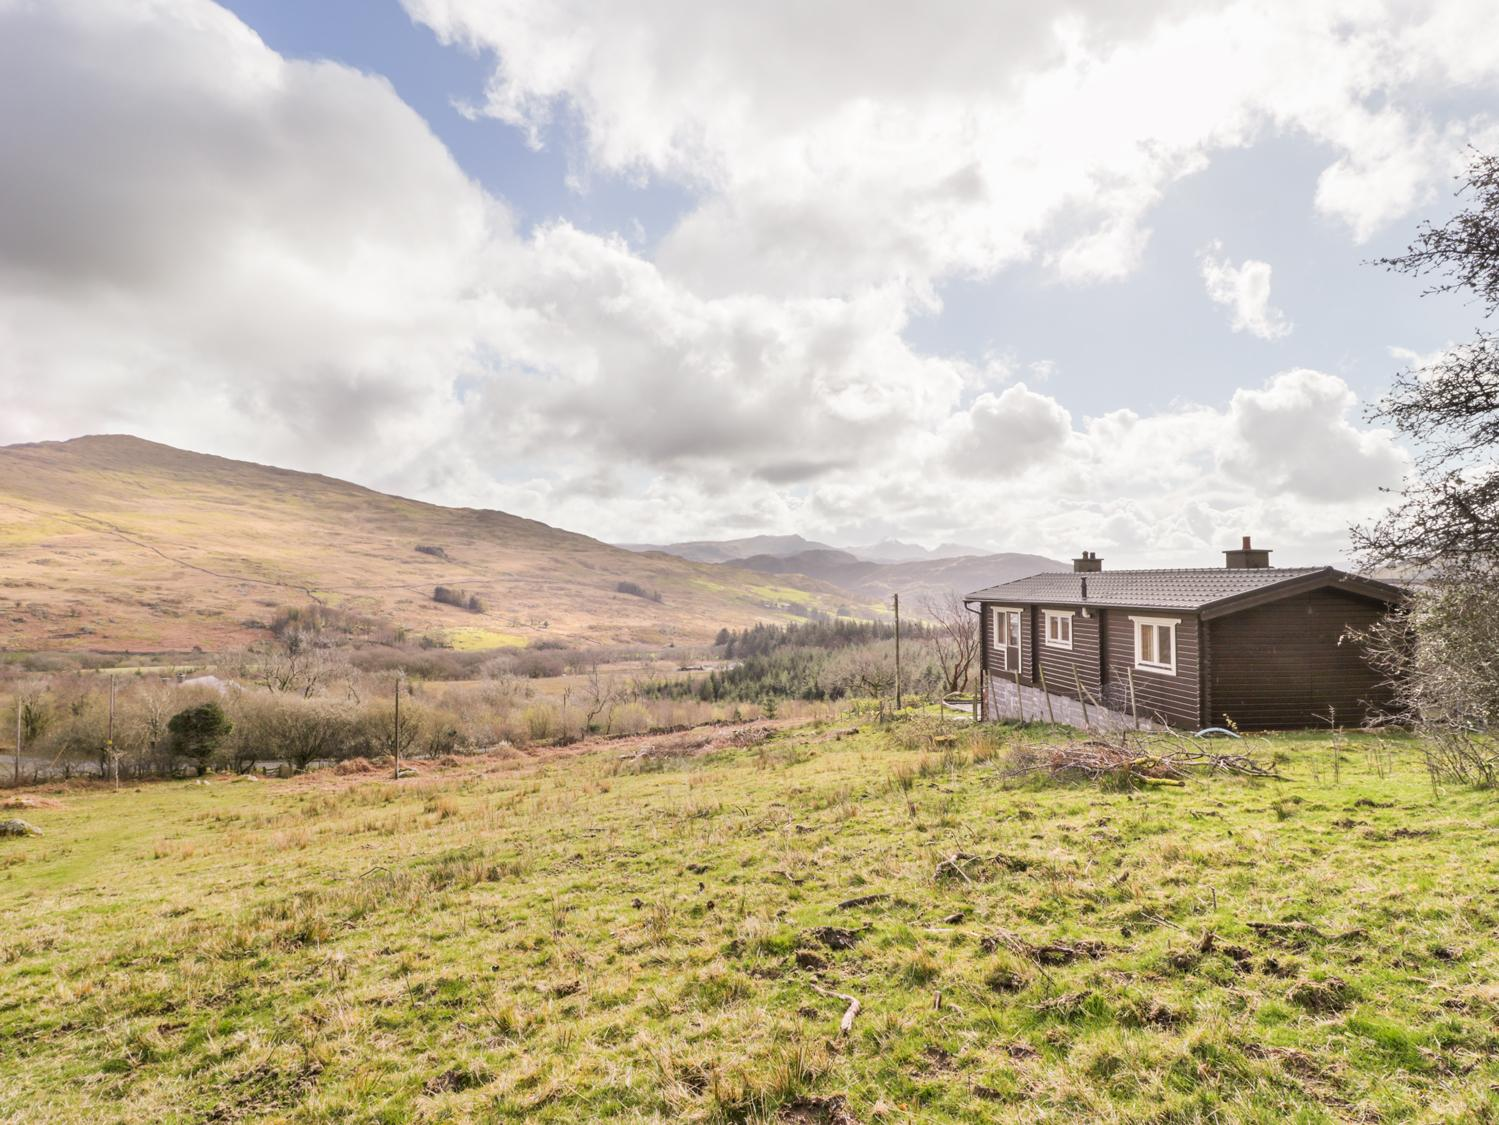 Snowdon Vista Cabin